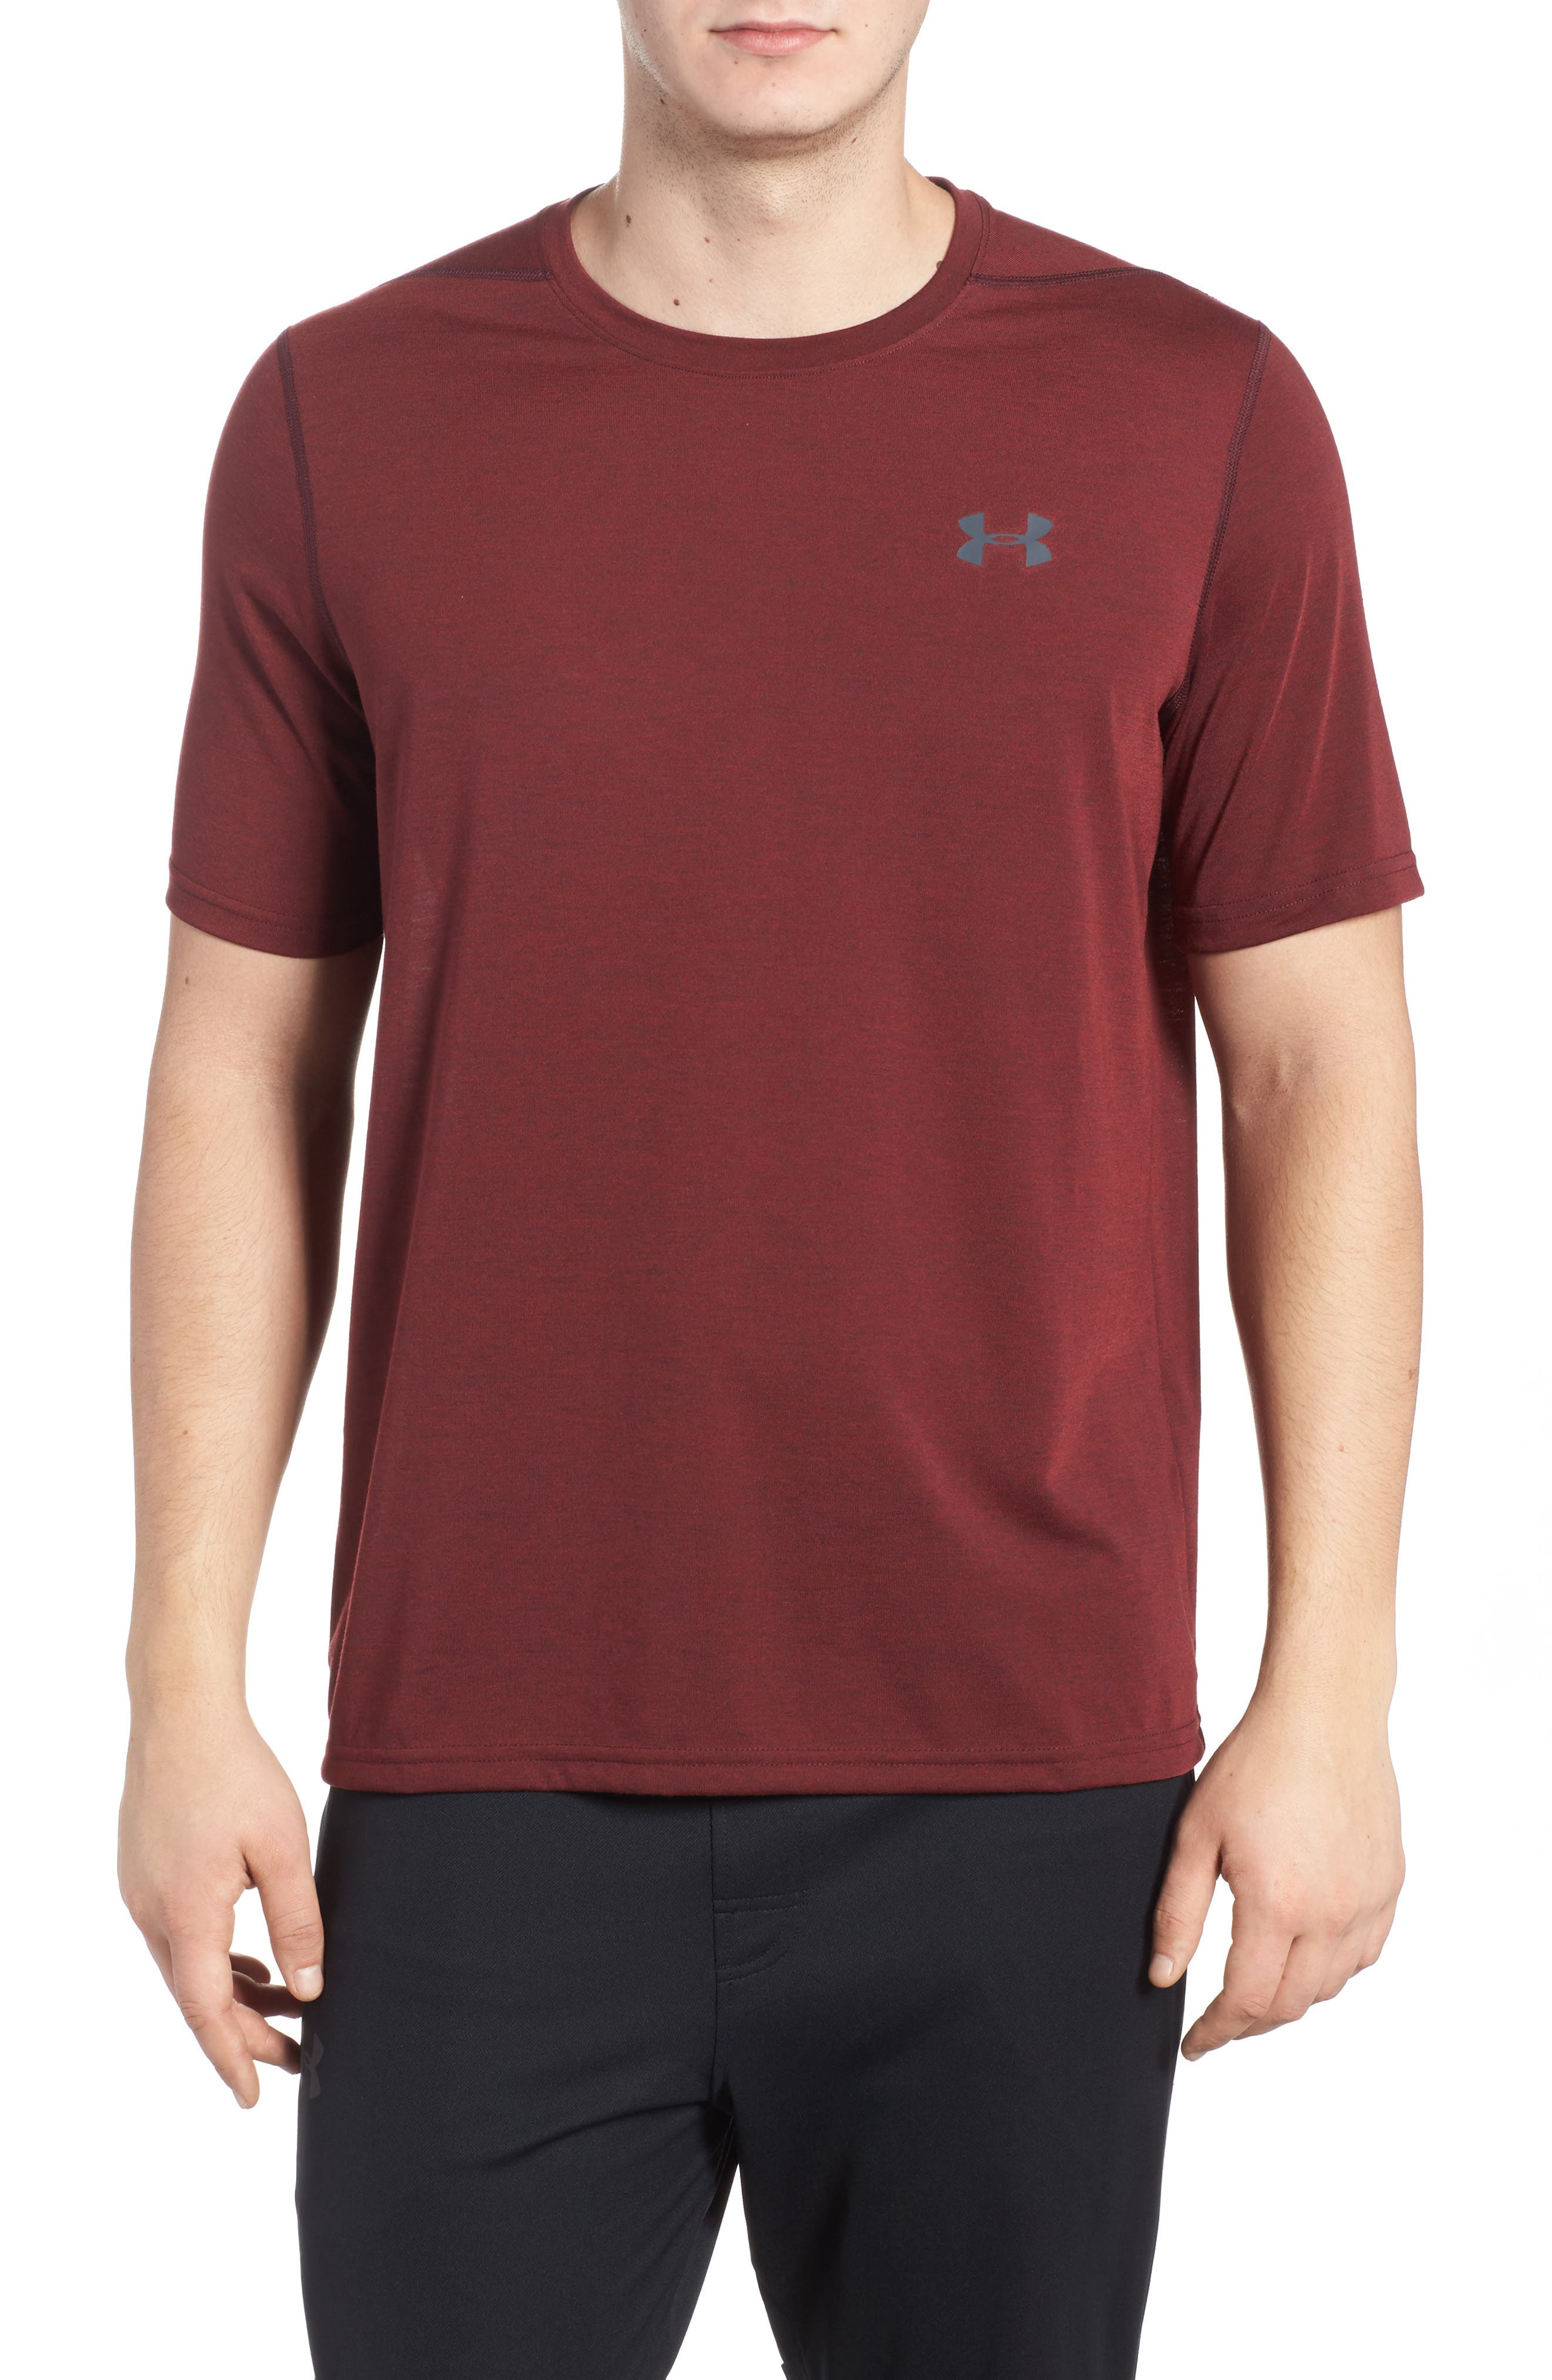 Main Image - Under Armour Threadborne Siro 3C Twist T-Shirt